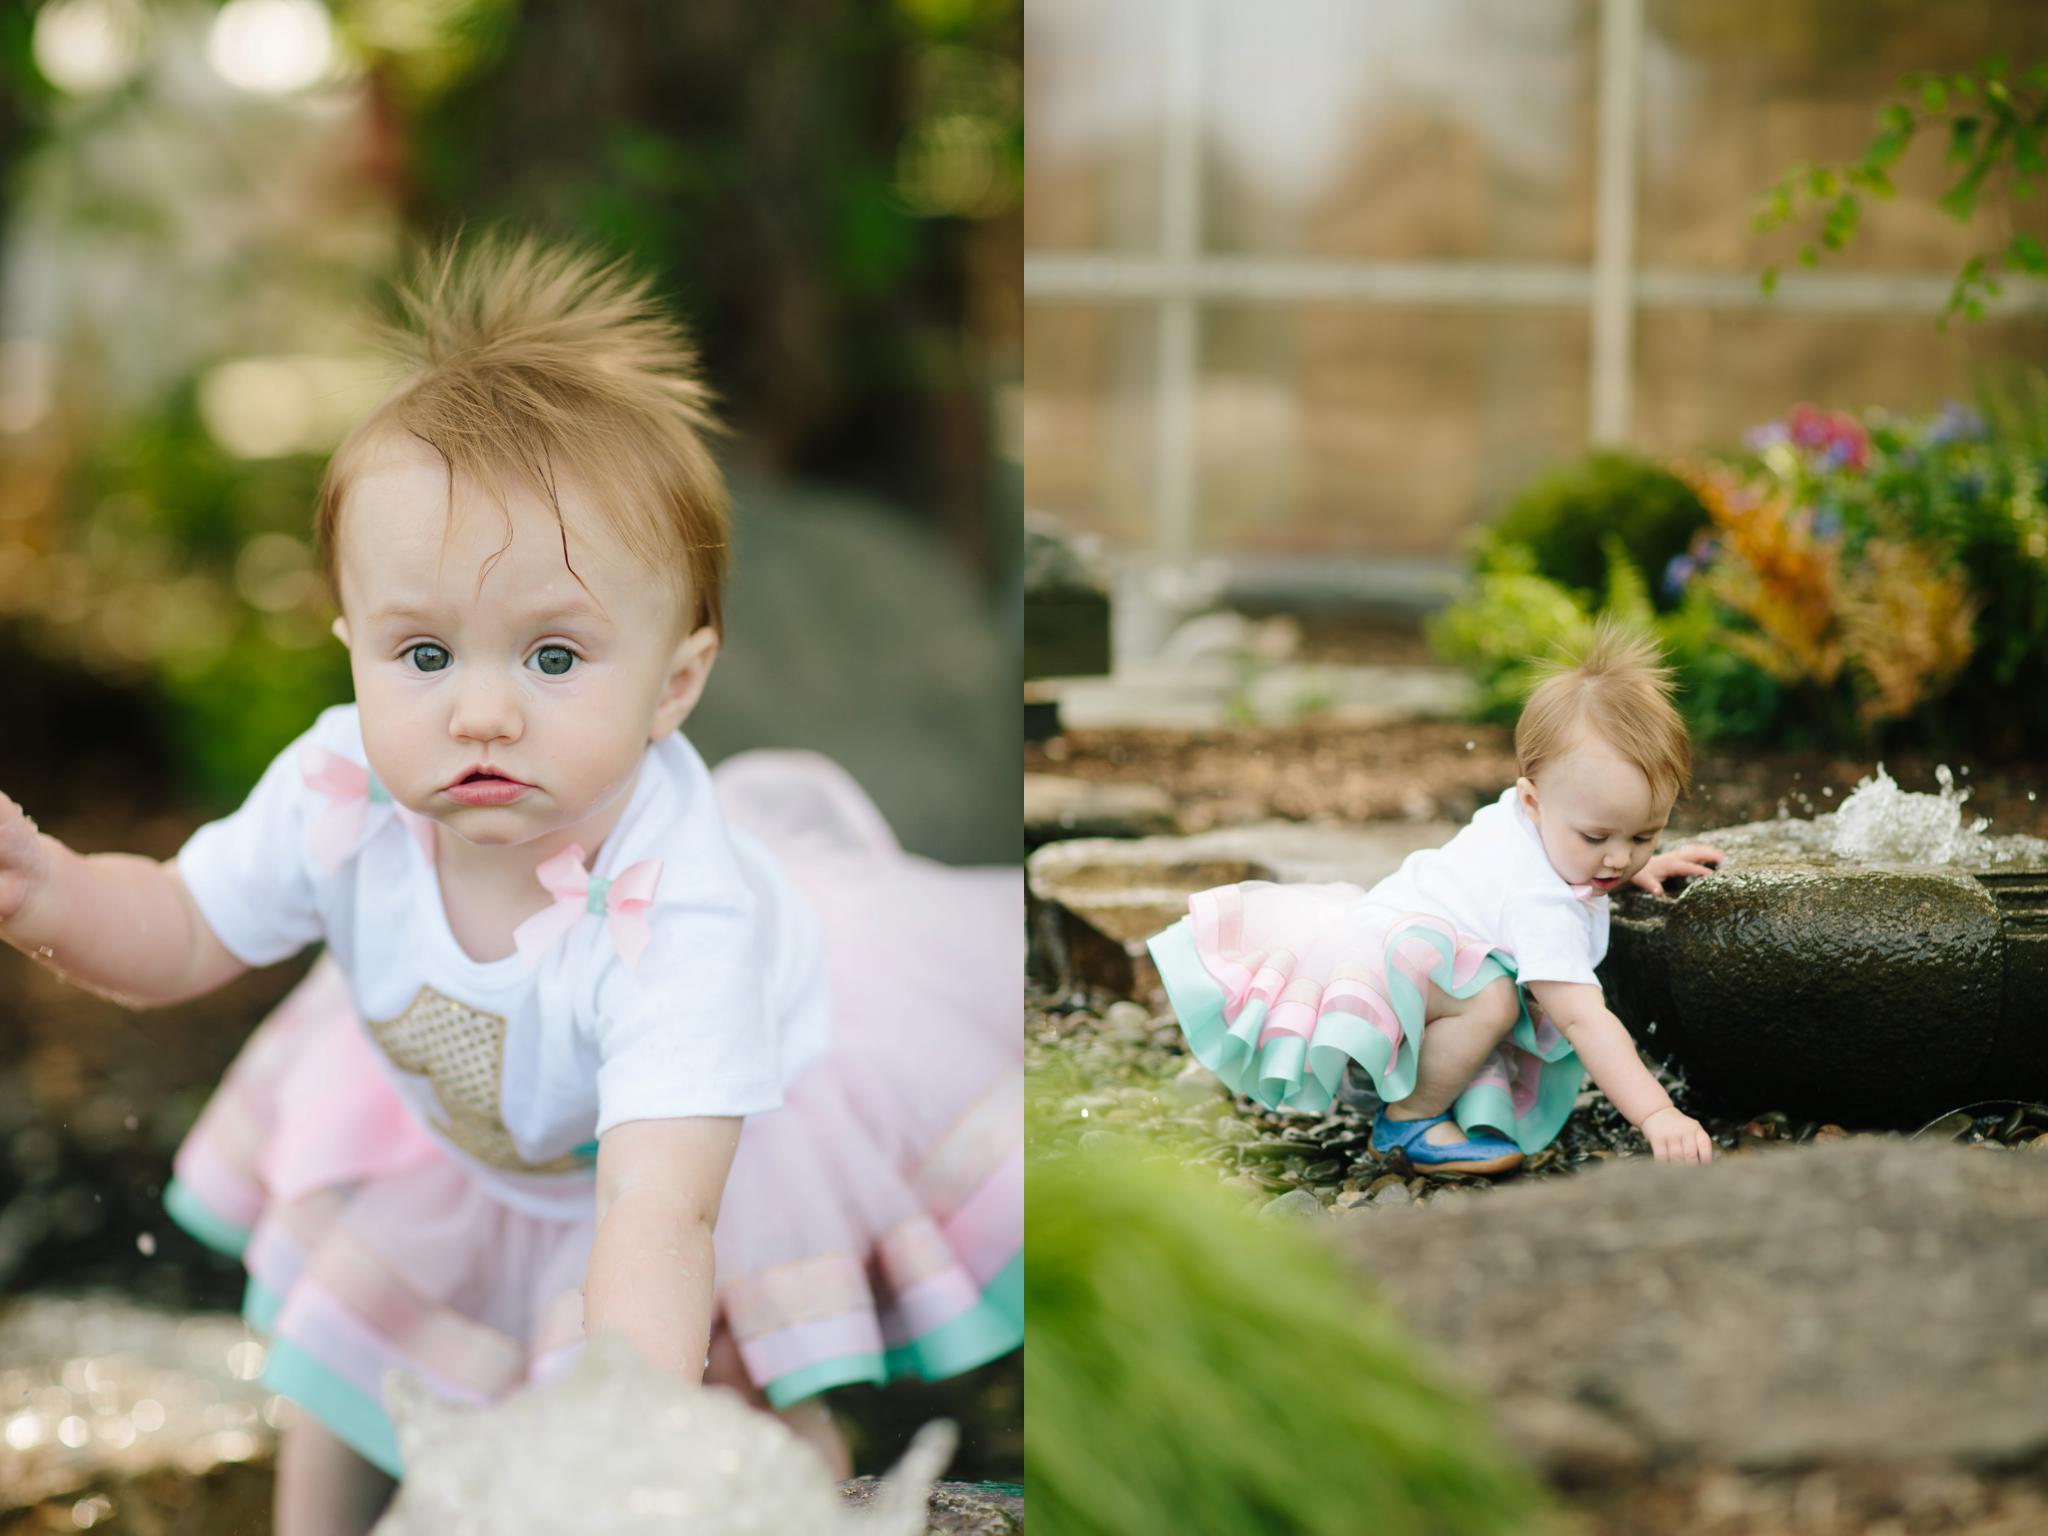 creekside_gardens_baby_portraits_0295.jpg